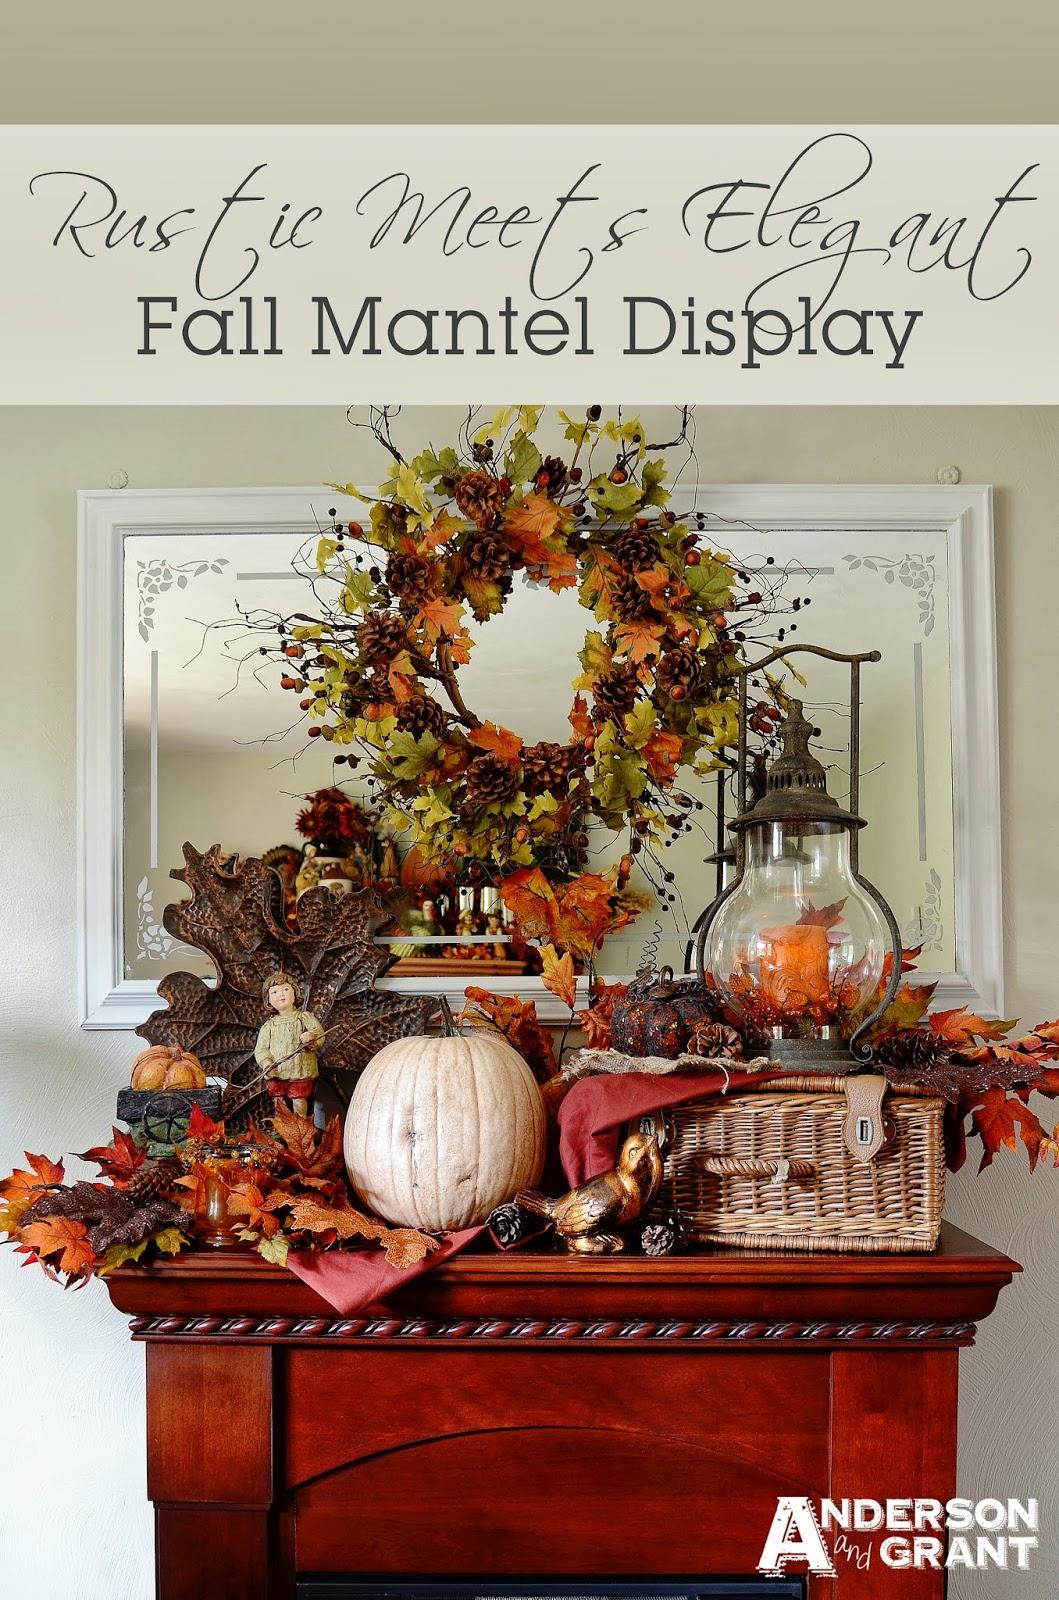 Rustic meets elegant fall mantel display anderson grant for Autum decoration